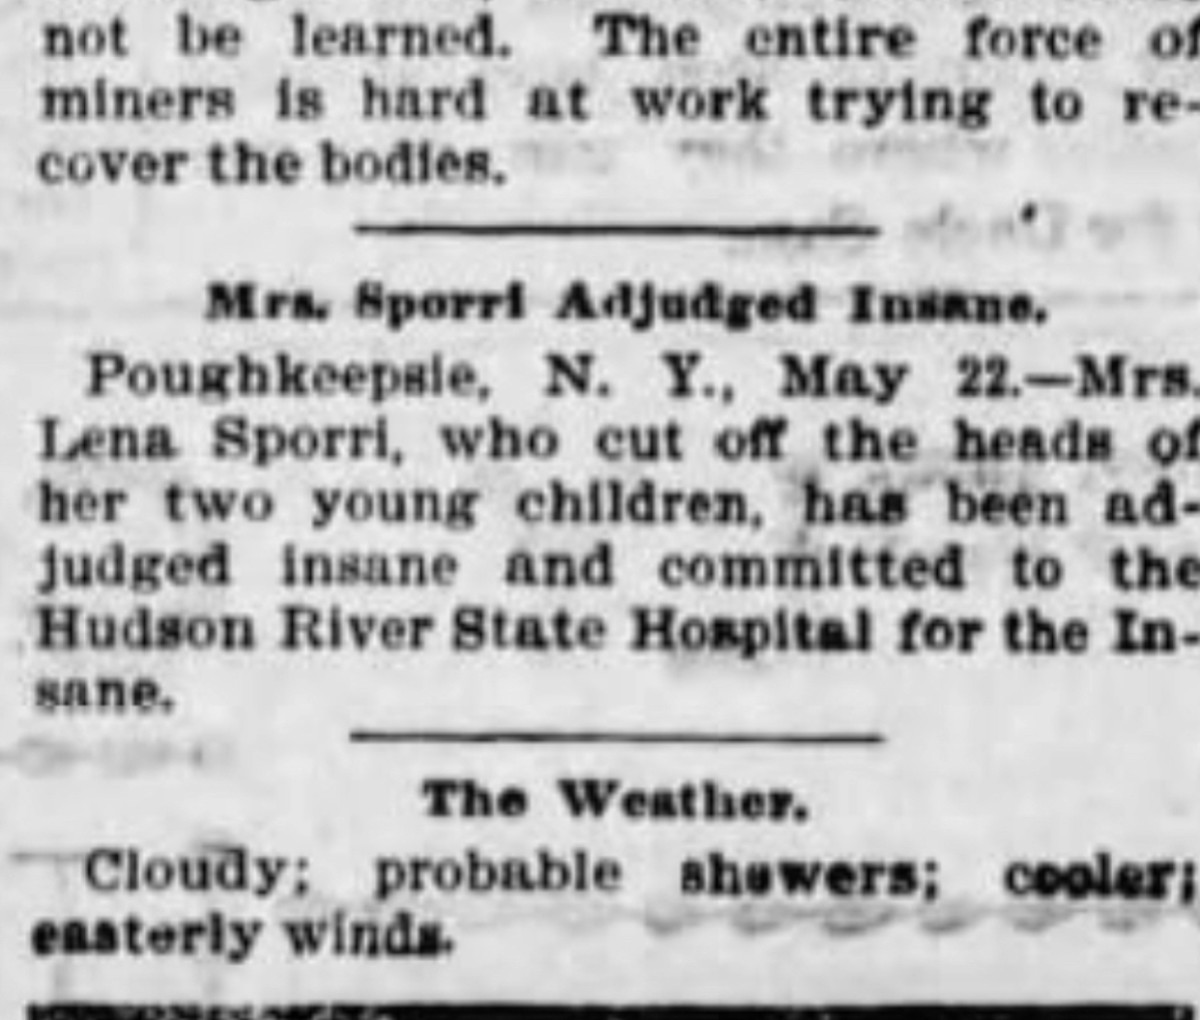 Column in the Poughkeepsie paper detailing Mrs. Sporri's atrocities (1898)